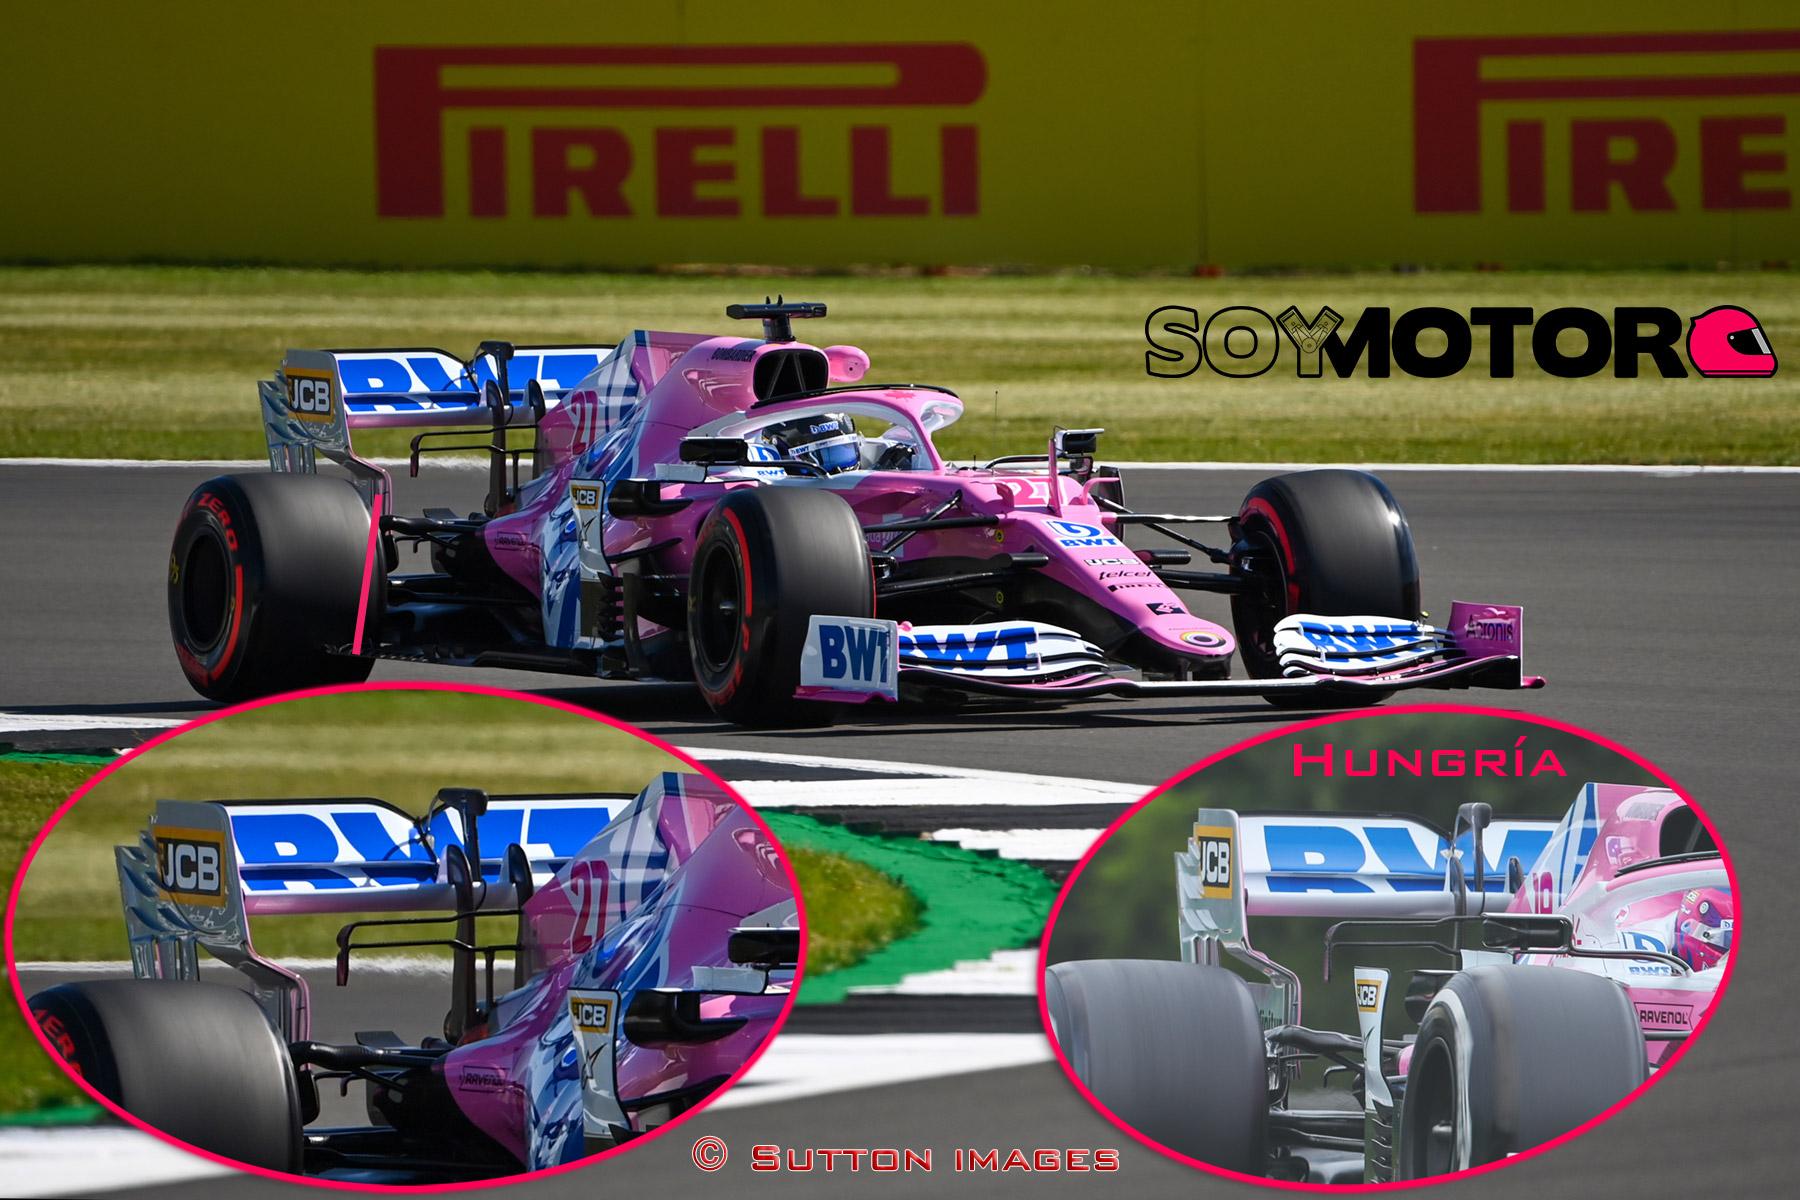 racing-point-configuracion-trasera.jpg